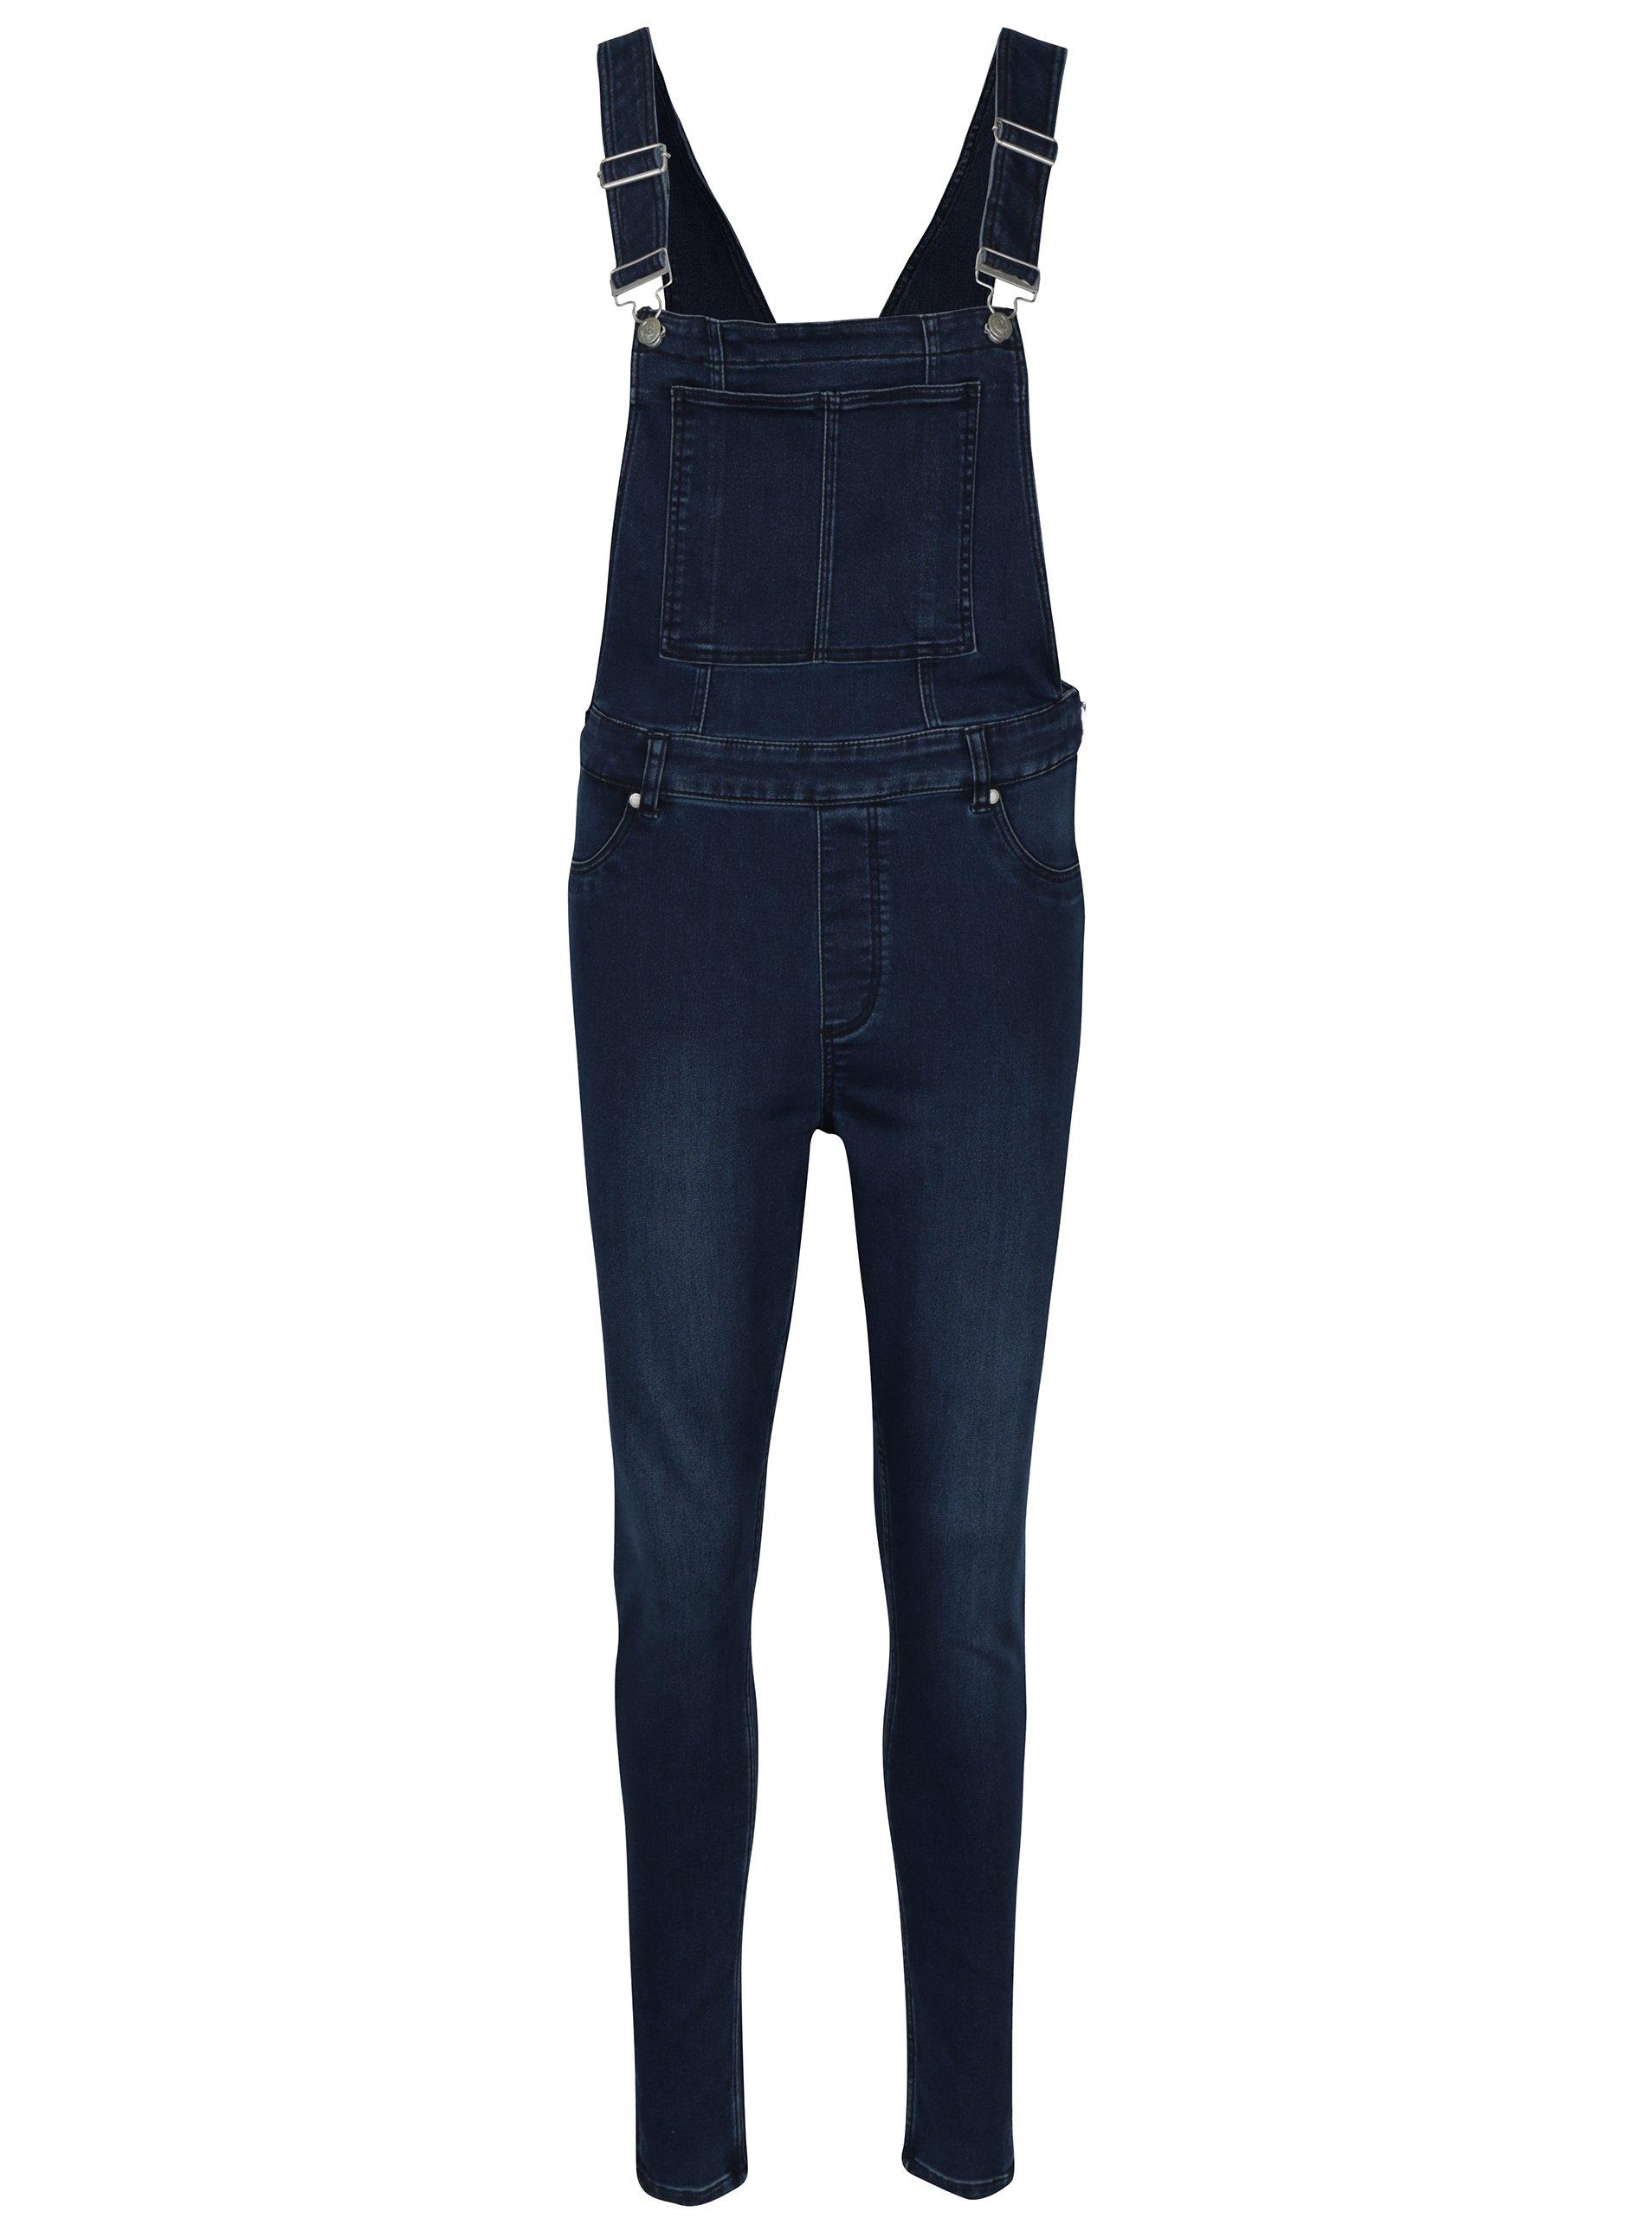 Tmavomodré dámske rifľové trakové nohavice s vysokým pásom Cheap Monday 8b8283a3134